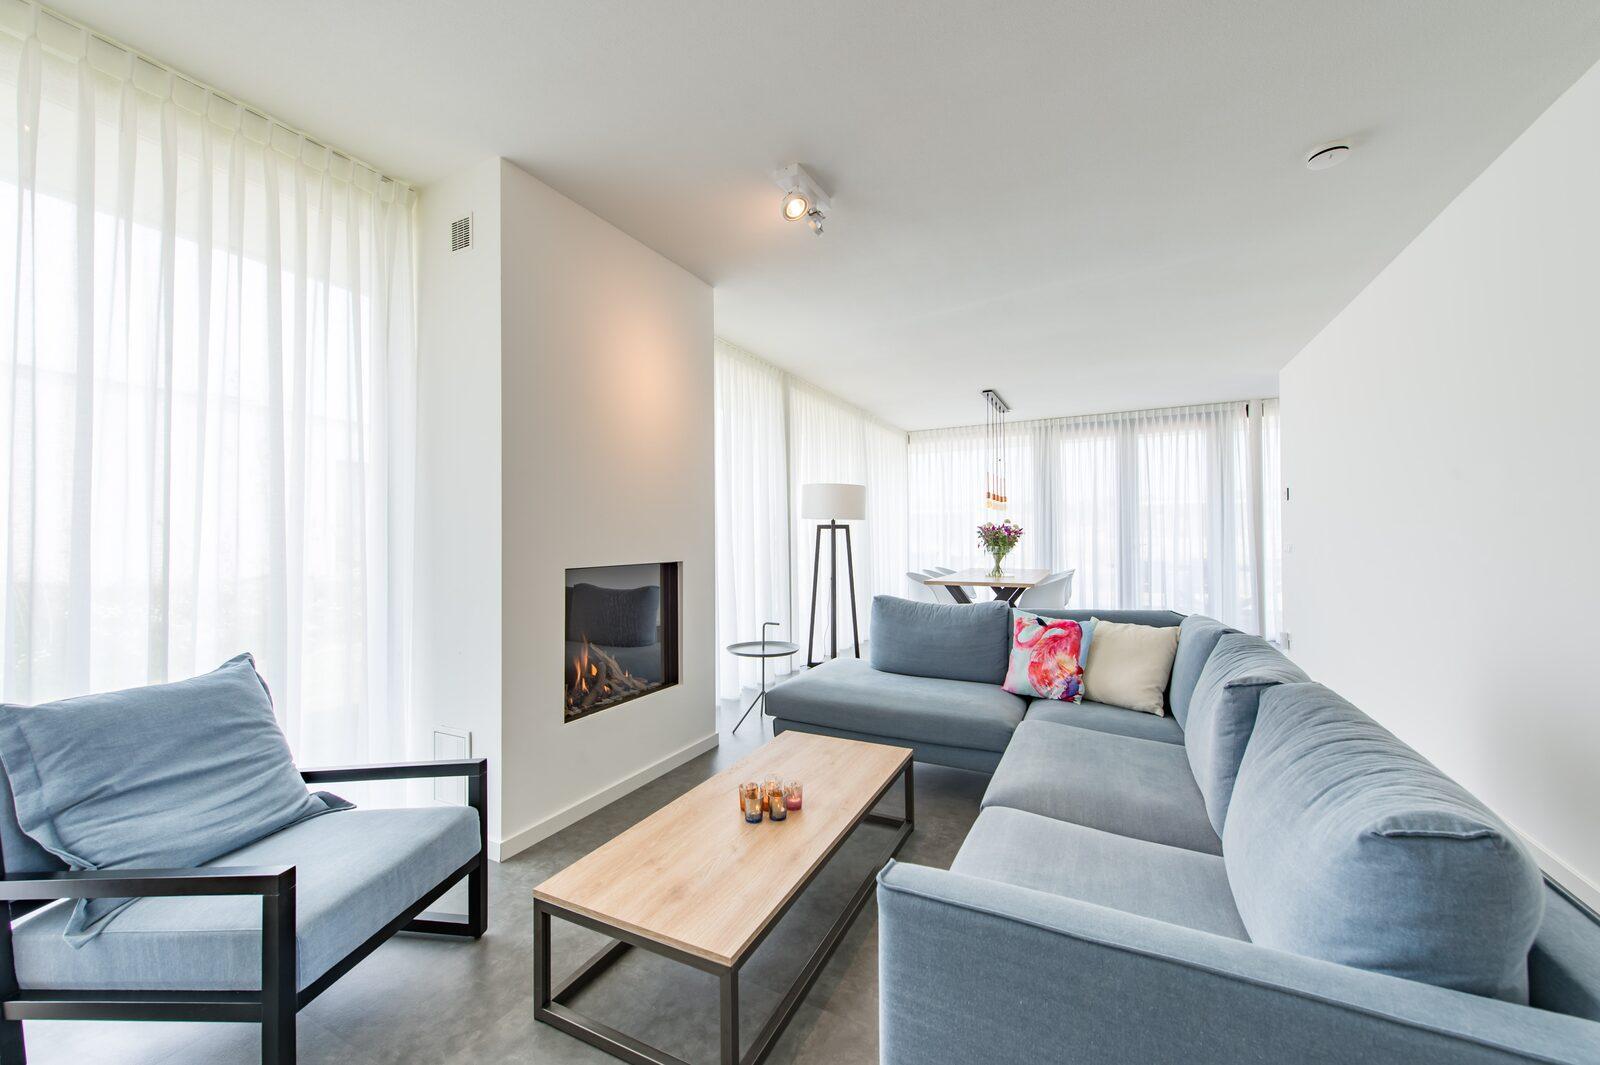 Luxus-Ferienhaus mit Whirlpool zandvillas zandbank 25